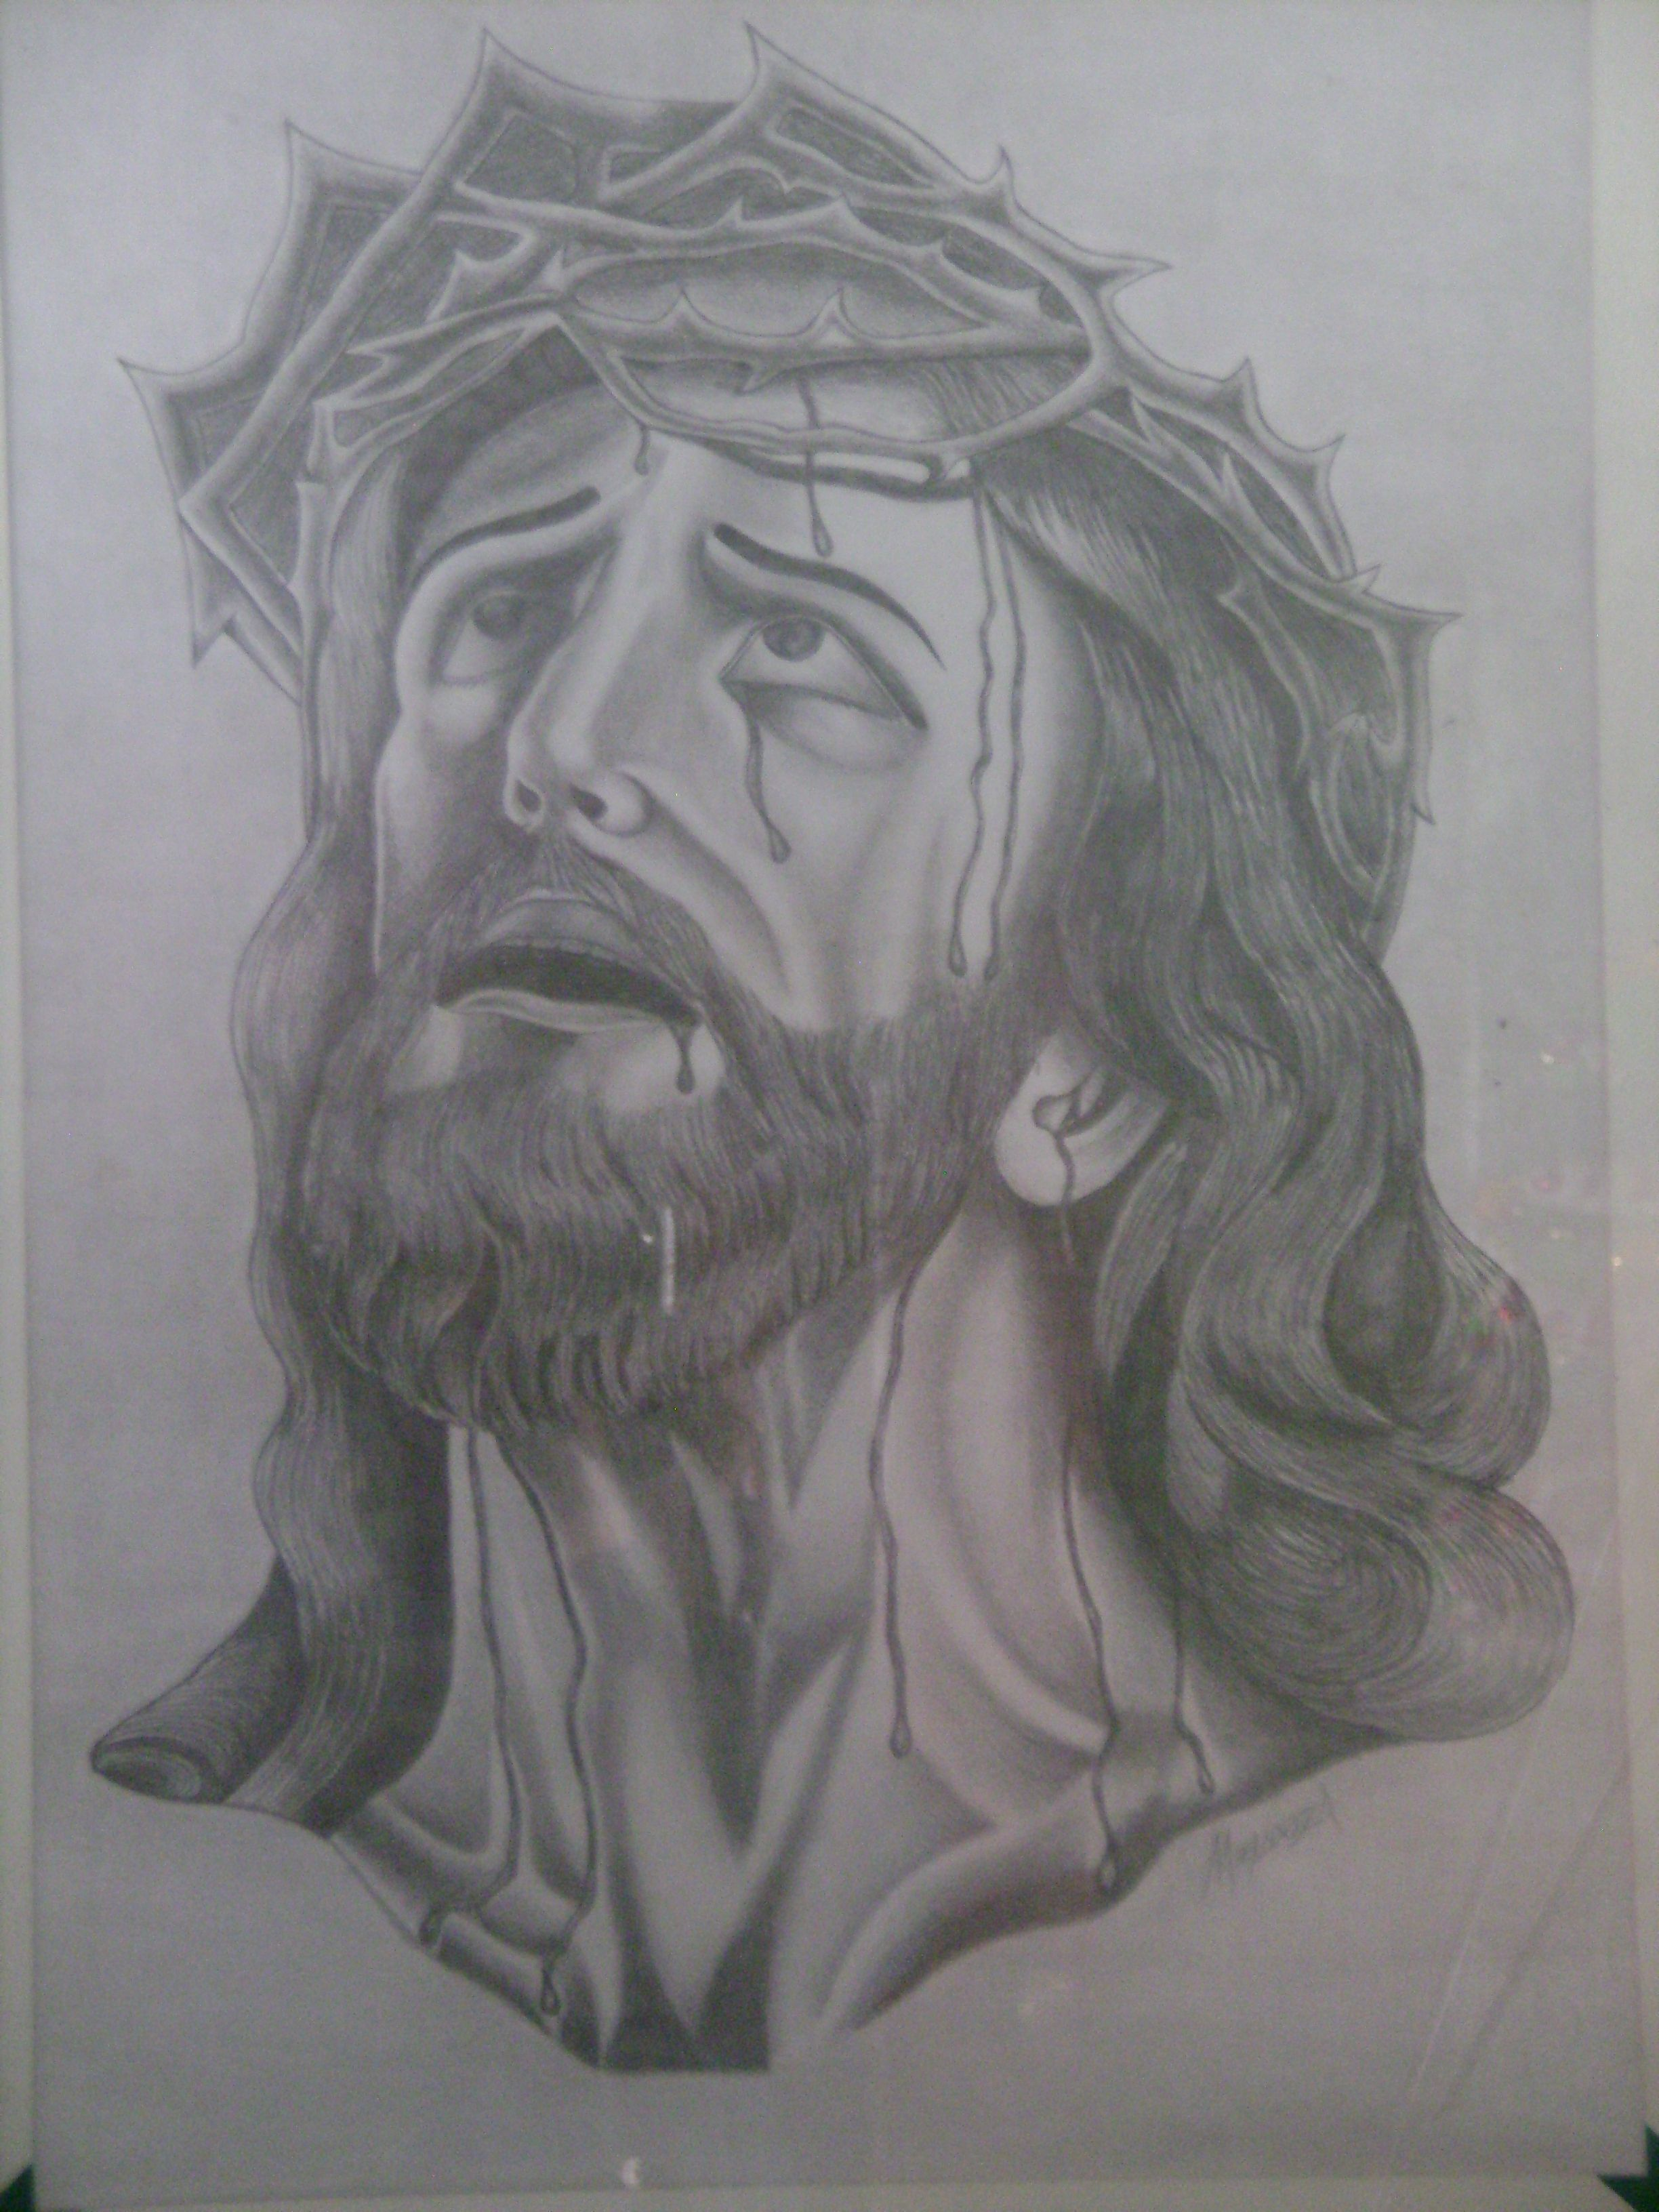 Rostro De Cristo A Lapiz Sobre Cascaron De Huevo Dibujos A Lapiz Rostros Dibujos Proyectos Graficos